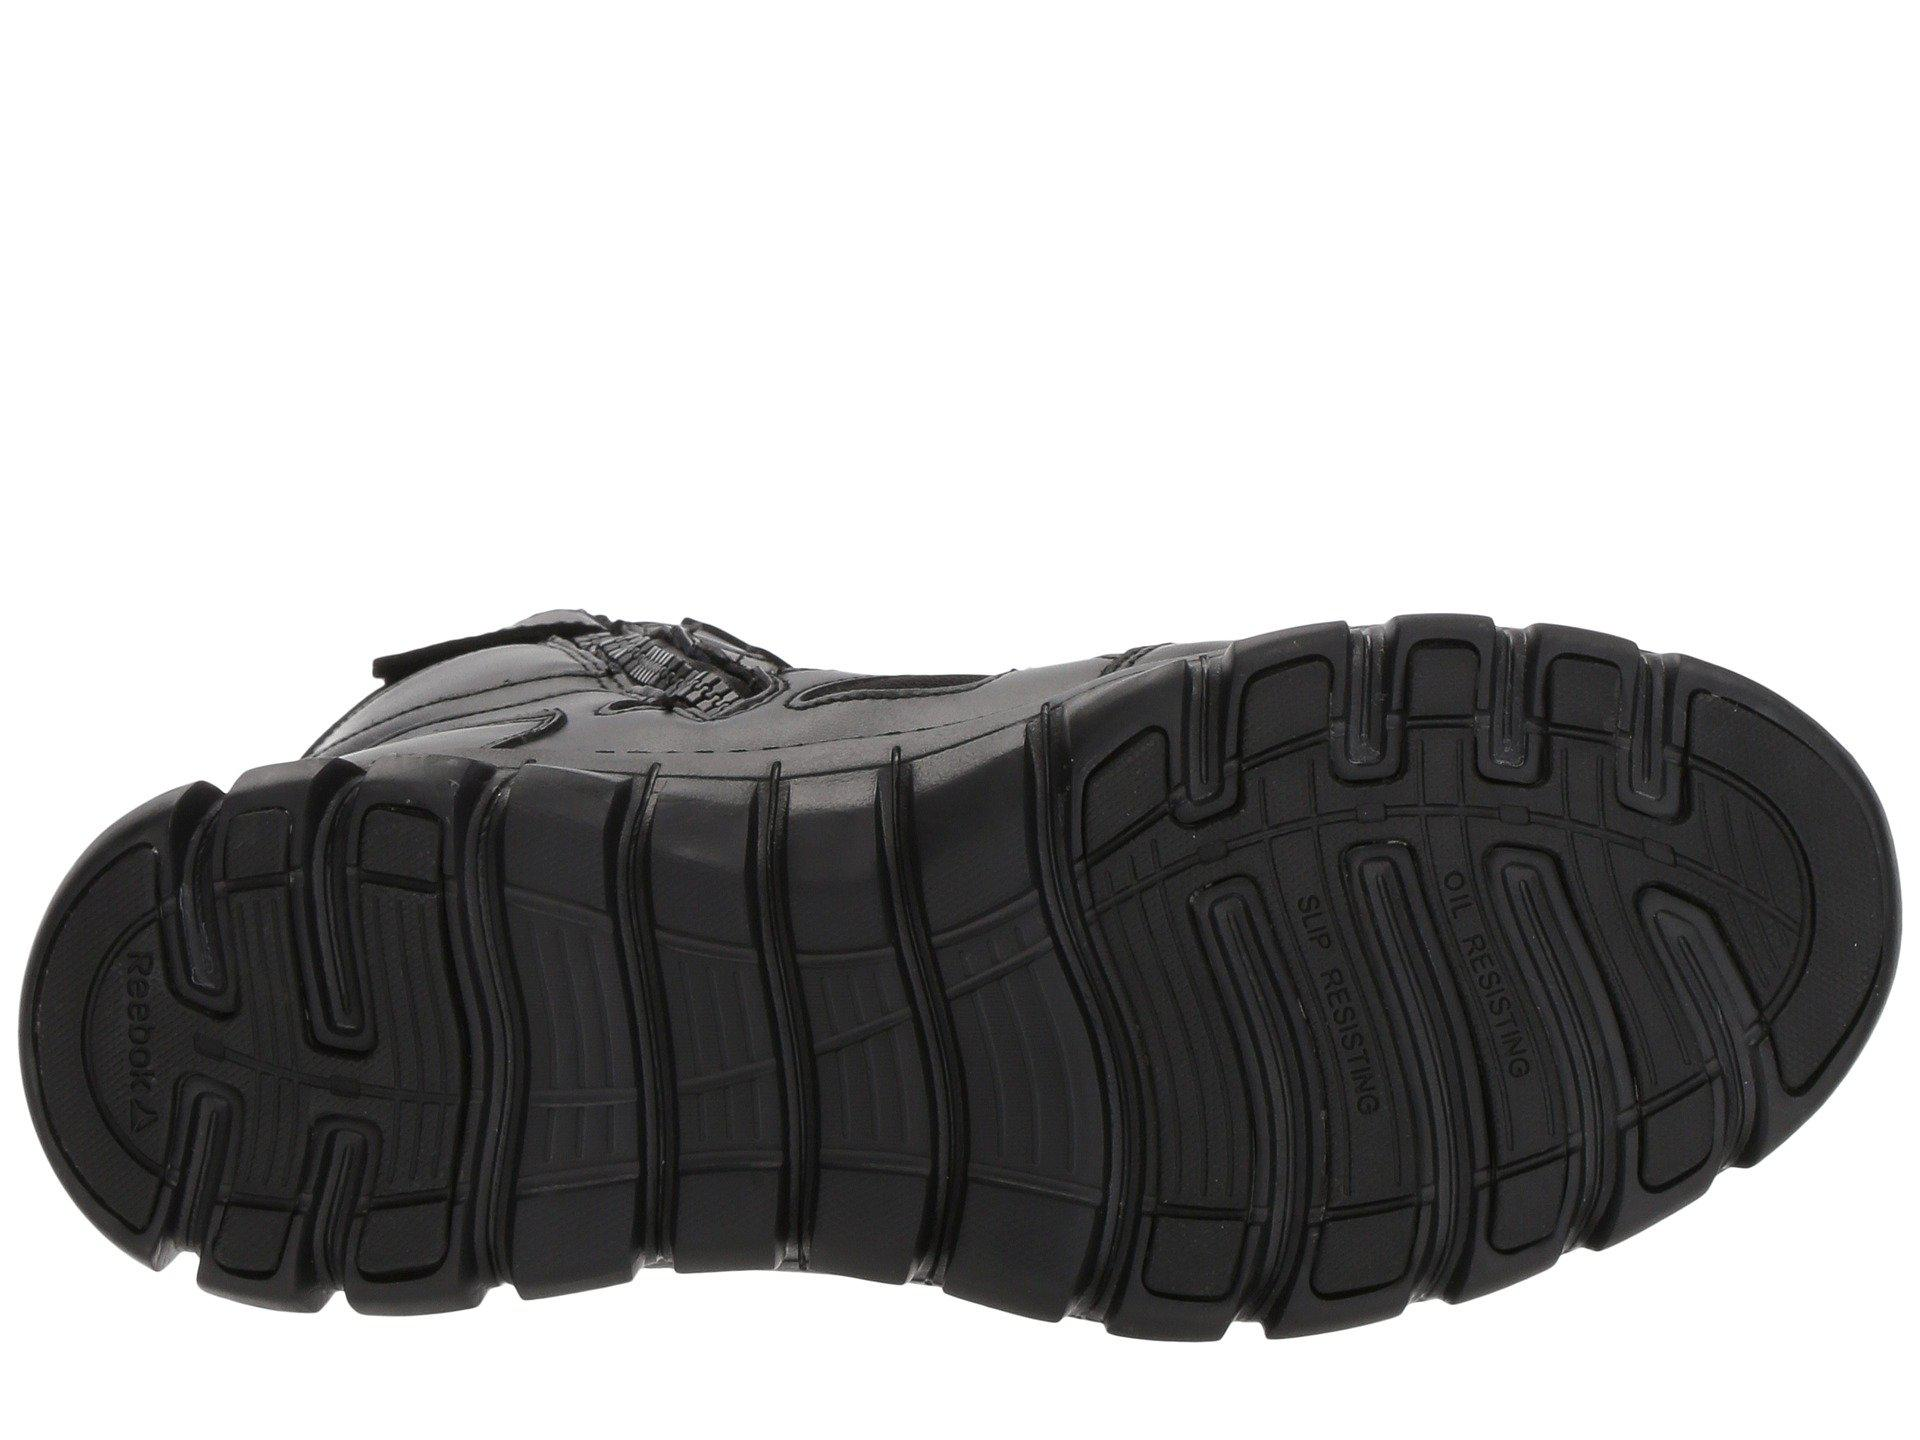 Reebok - Sublite Cushion Tactical (black 5) Men s Boots for Men - Lyst.  View fullscreen 1a9bd214b